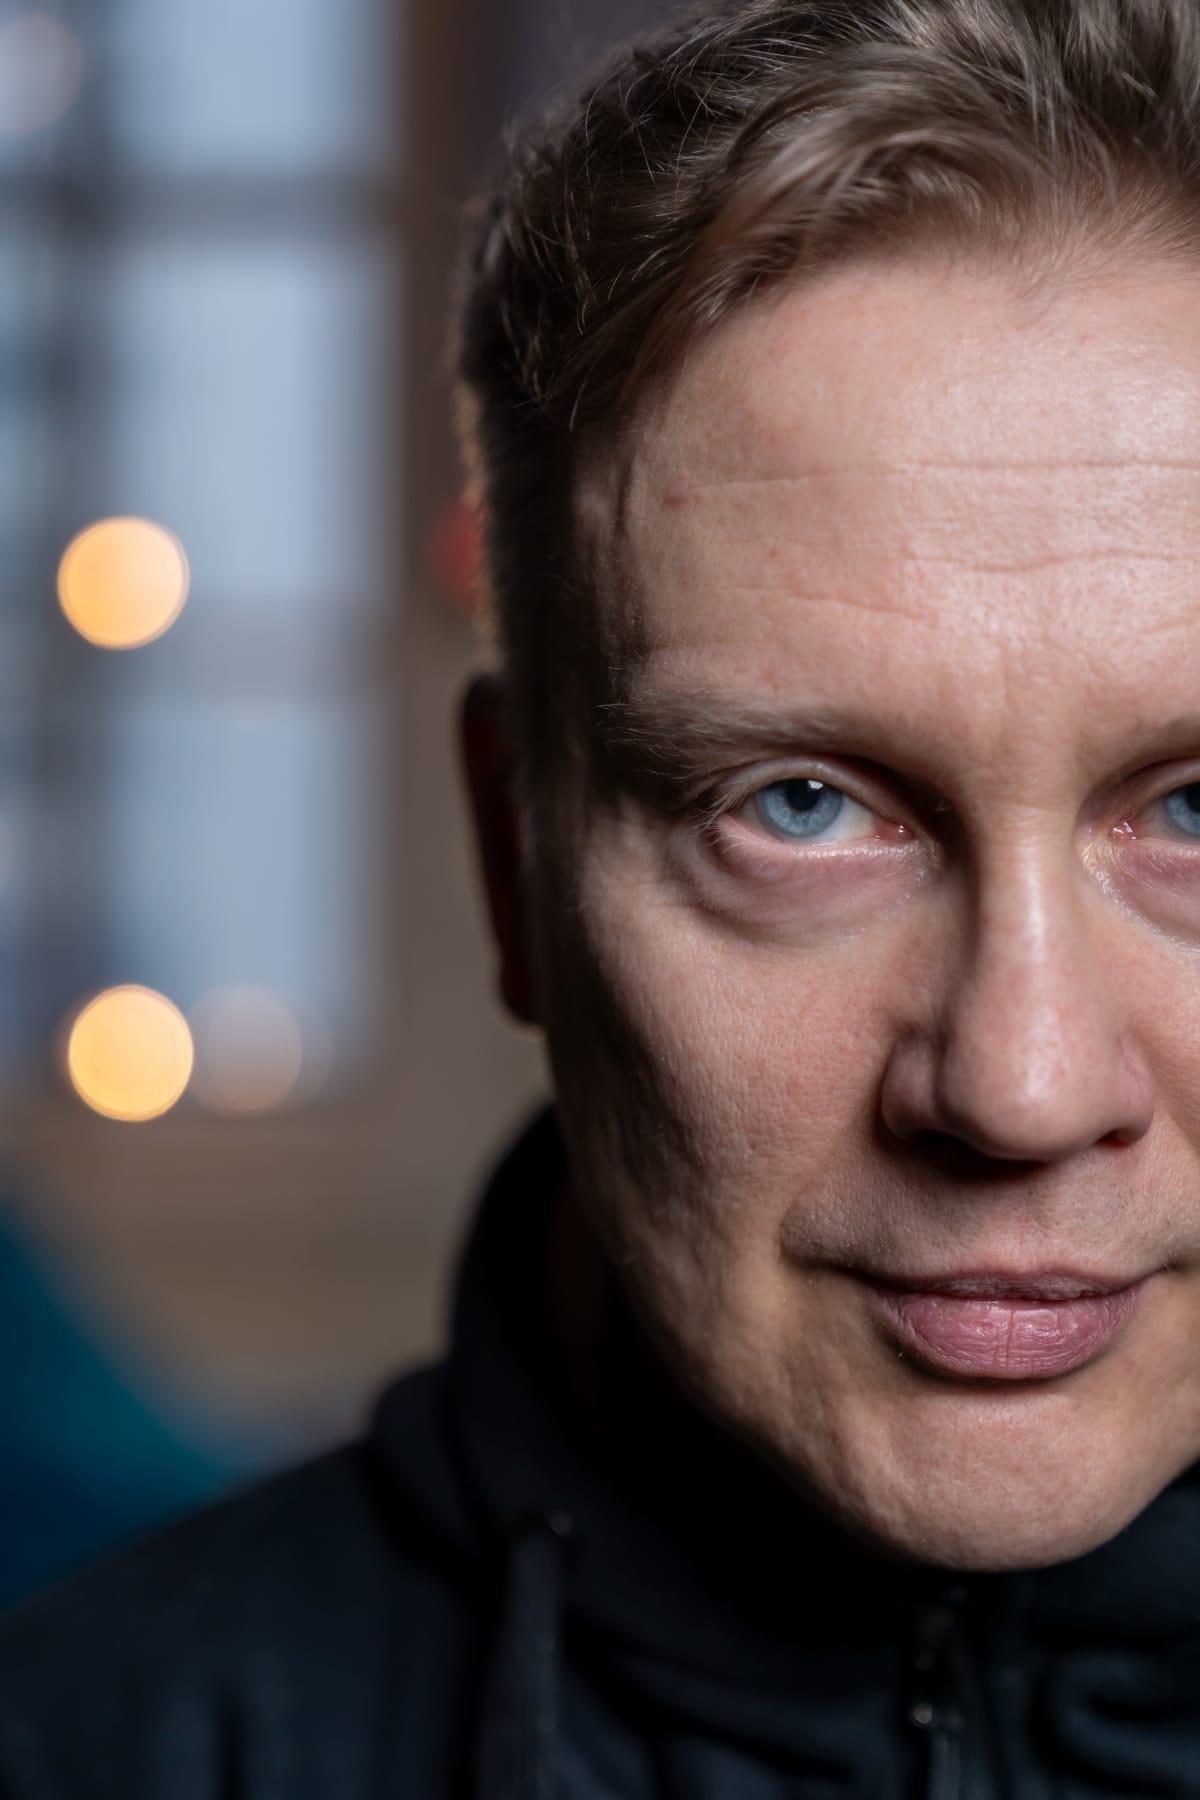 Kuvataiteilija, teatteriohjaaja, kirjailija ja kuvataiteen tohtori Teemu Mäki, Kaapelitehdas, Helsinki, 28.1.2020.